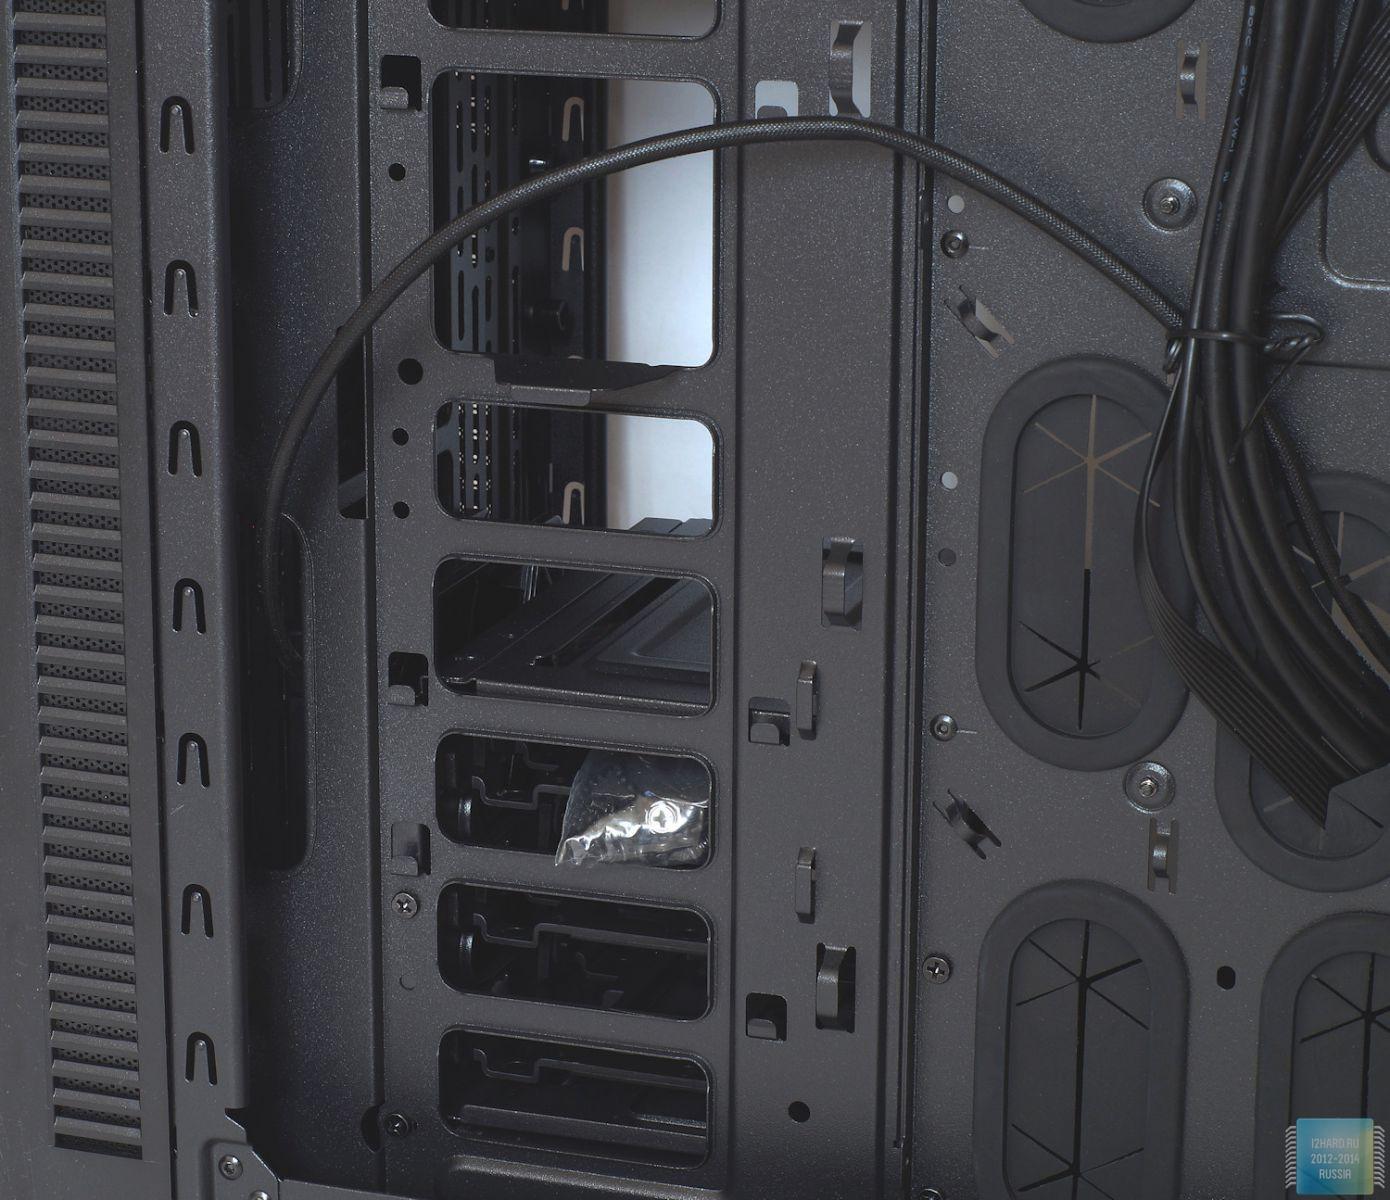 Внешний вид и строение корпуса Thermaltake Suppressor F31